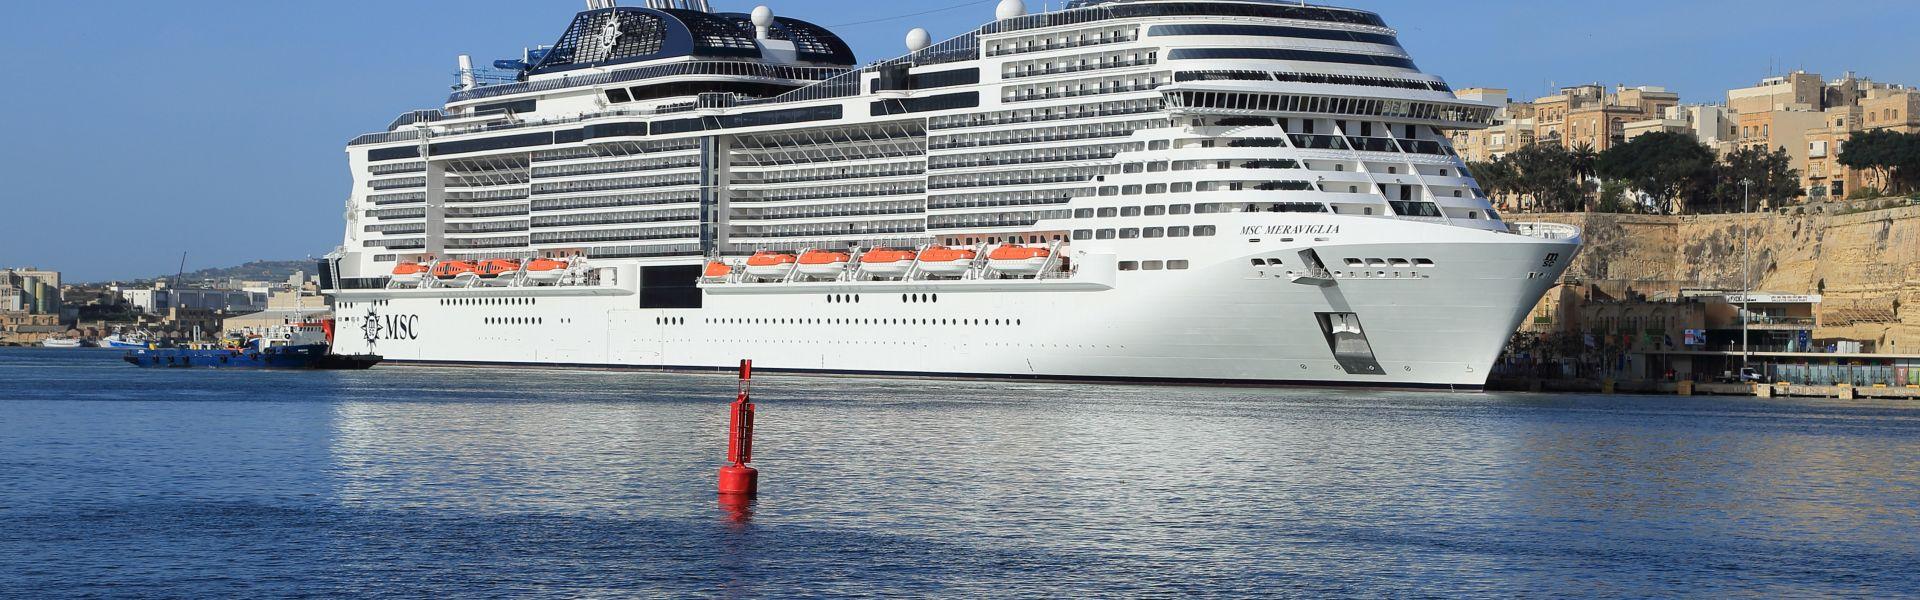 Croaziera 2018/2019 - Mediterana de Vest (Barcelona) - MSC Cruises - MSC Meraviglia - 7 nopti